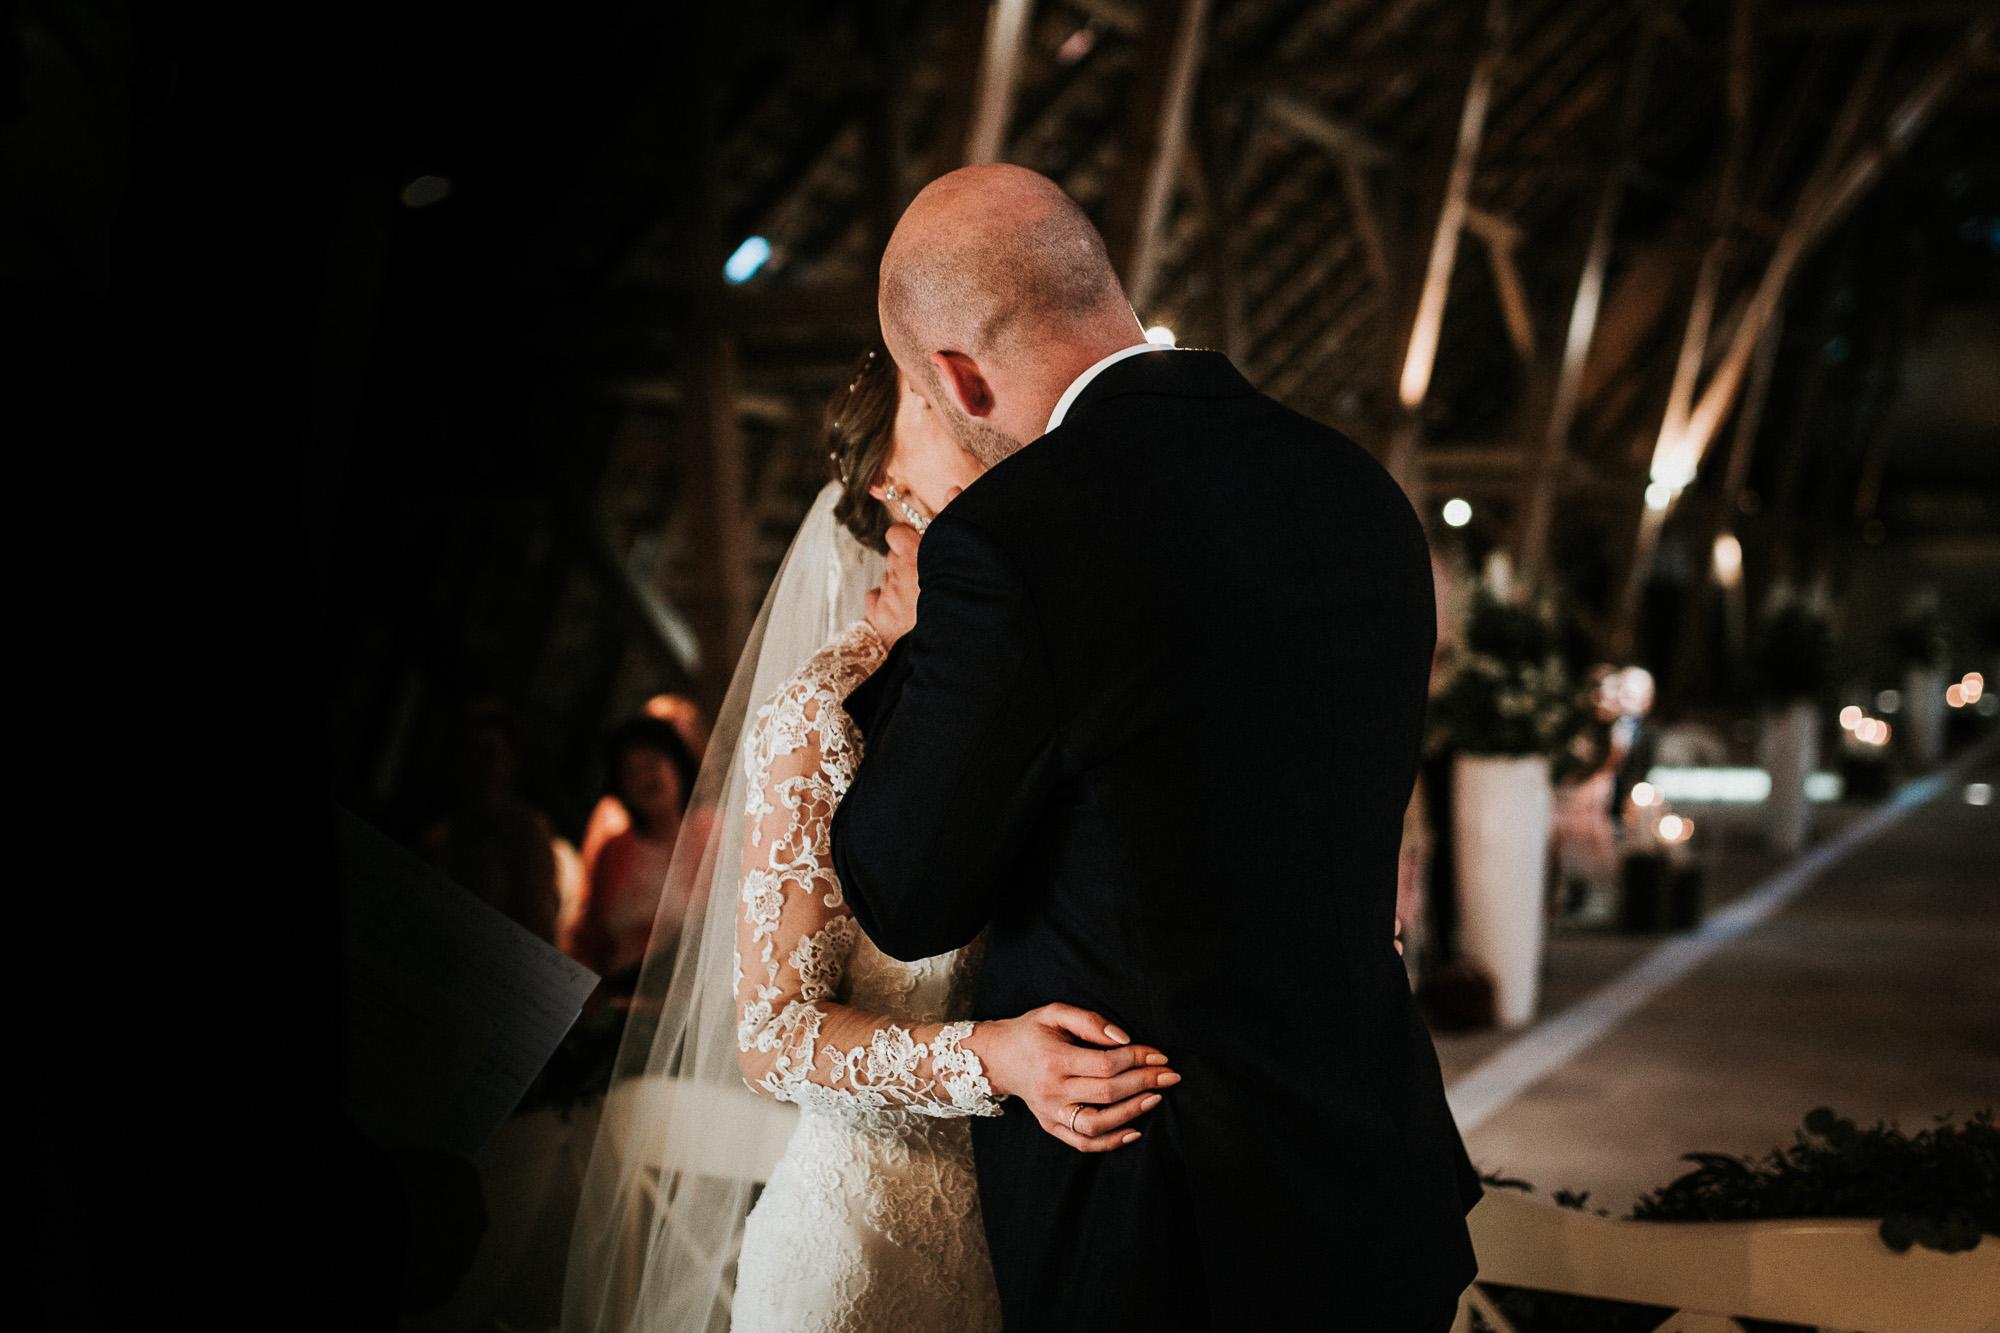 DanielaMarquardtPhotography_Hochzeitsfotograf_Düsseldorf_Köln_Mallorca_Bayern_Austria_Harz_Wedding_AileenundLennart_Weddingphotographer_Ibiza_Tuskany_Italien_Toskana_Portugal_Lissabon148